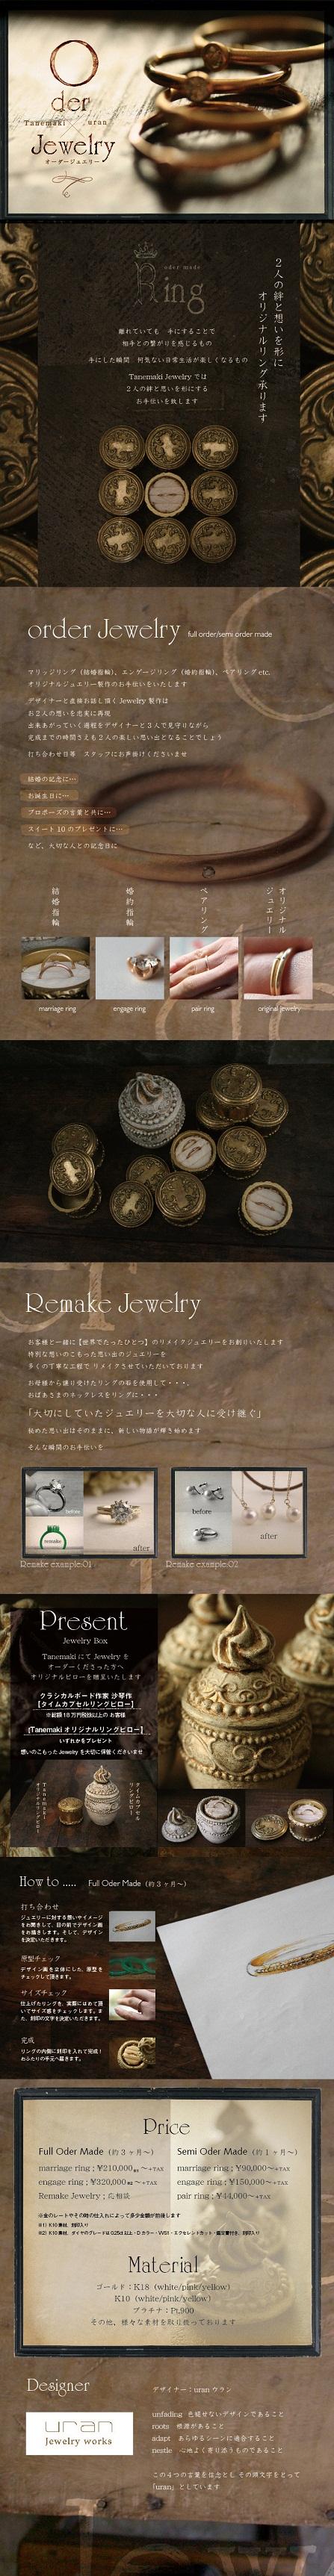 2014order_jewelry.jpg